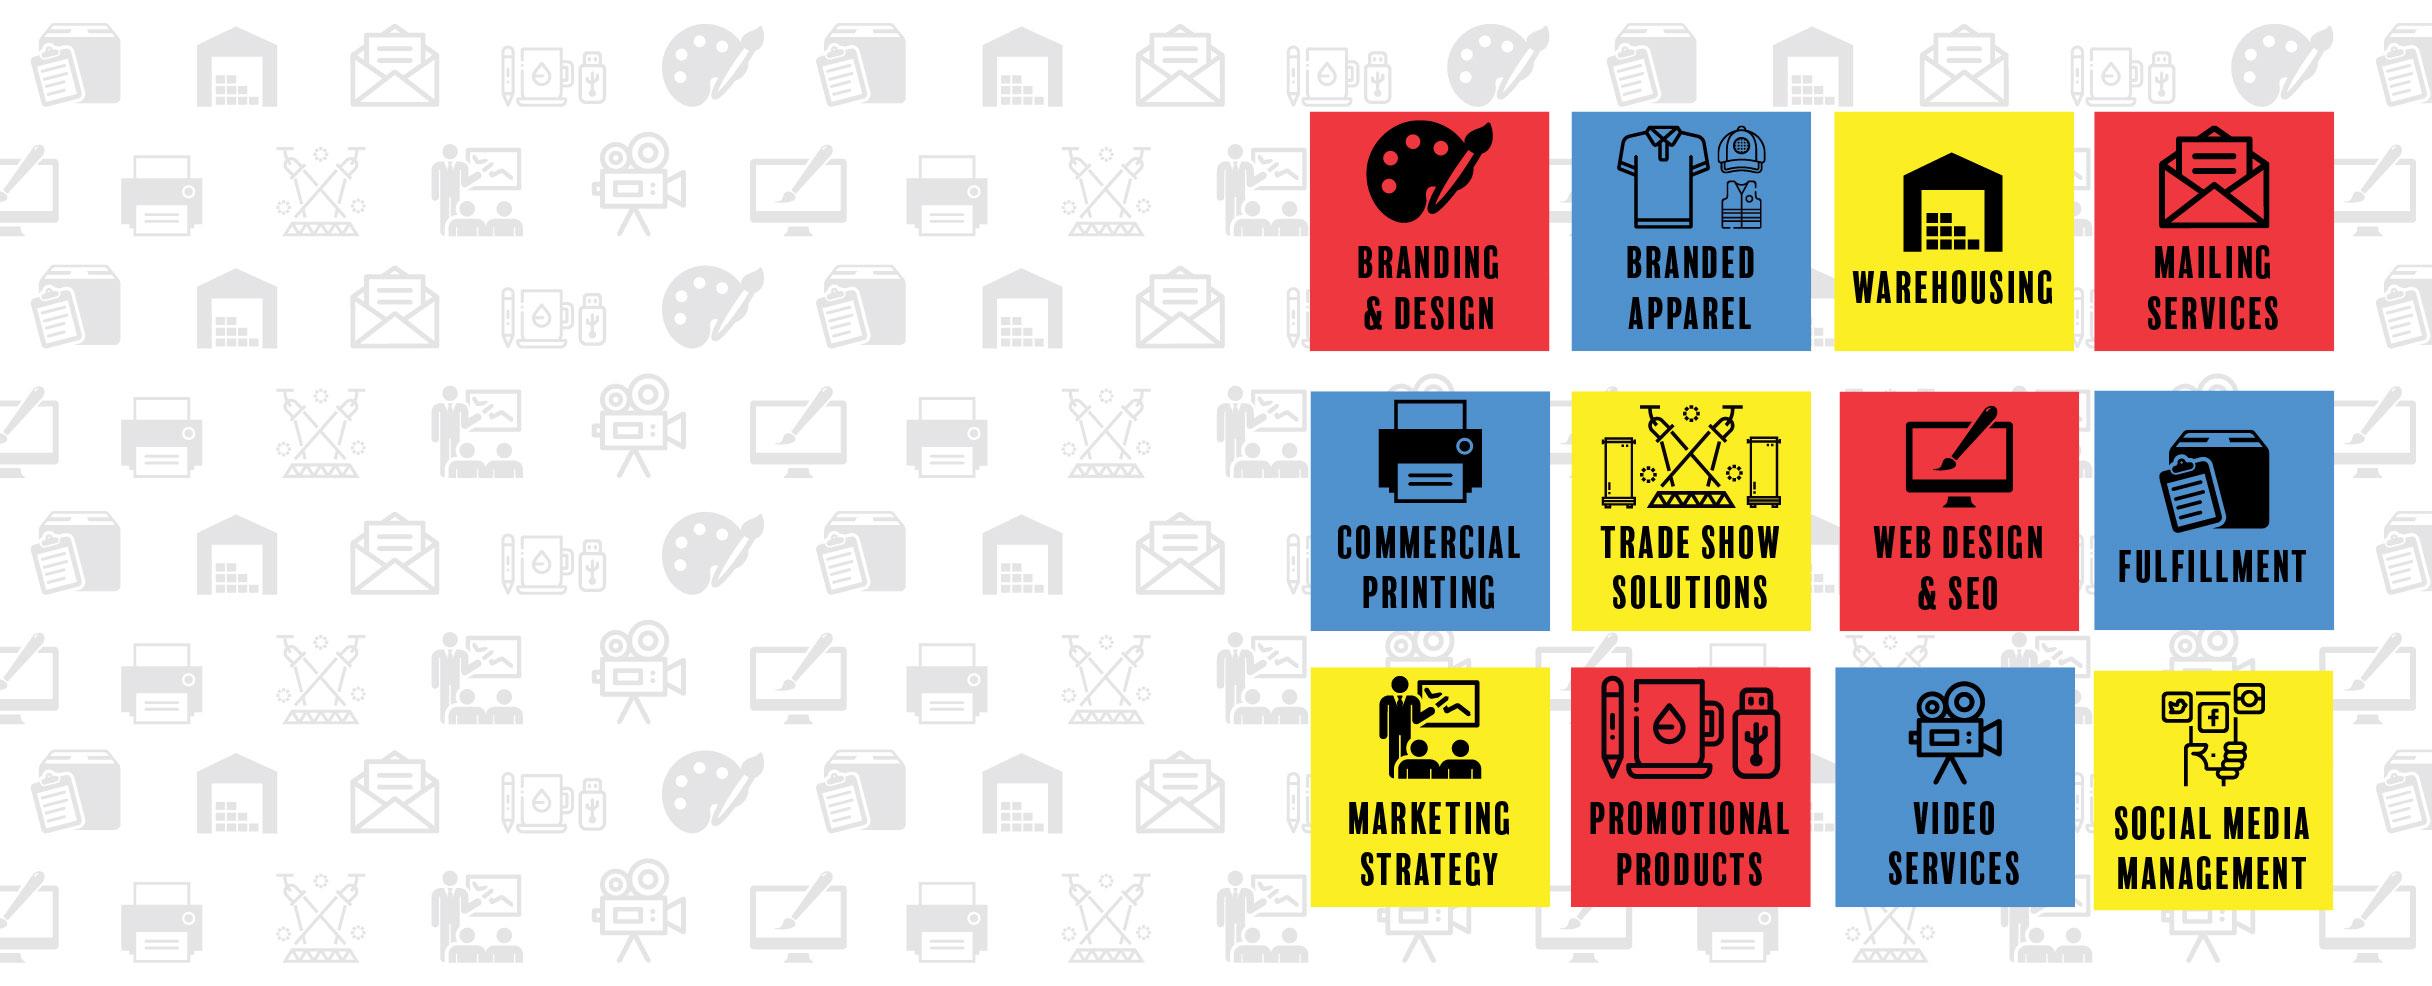 Make Marketing Personal